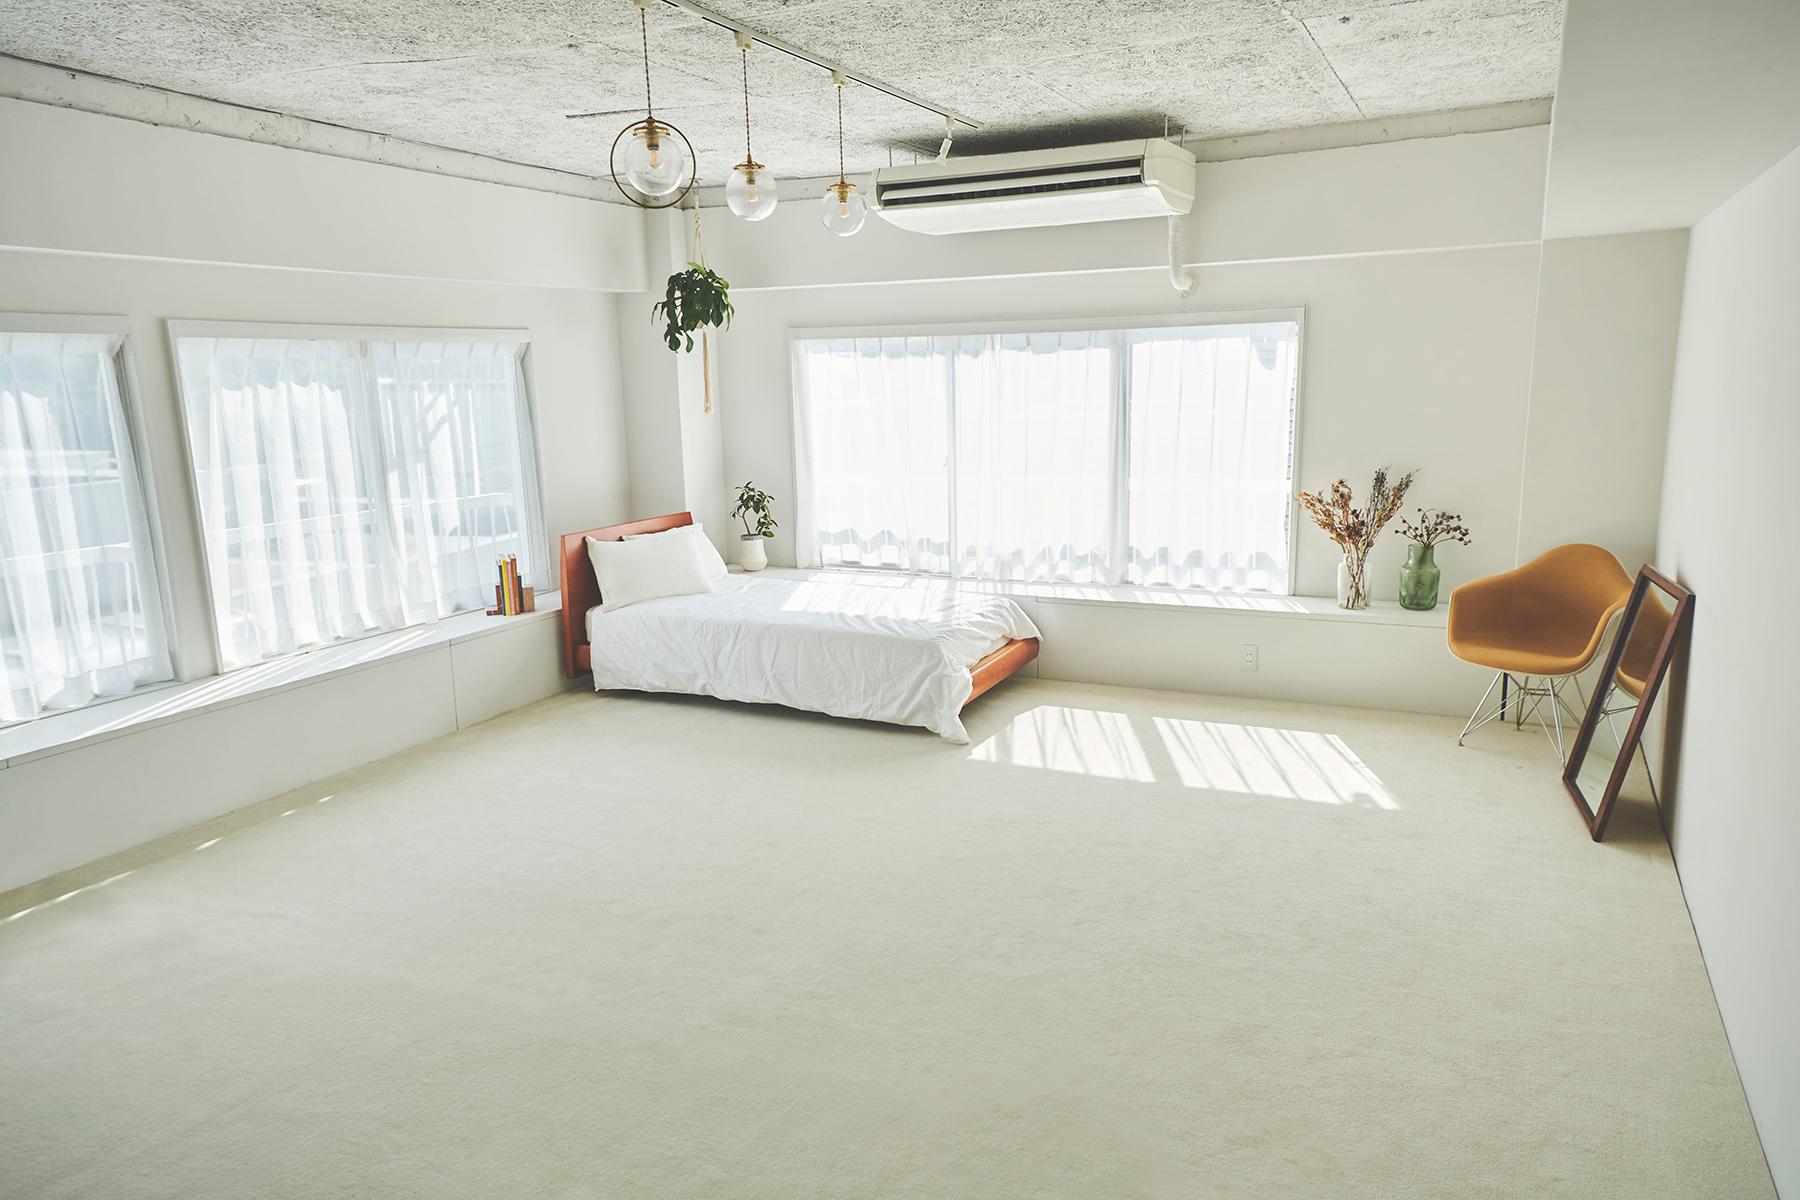 TILL STUDIO (ティル スタジオ)